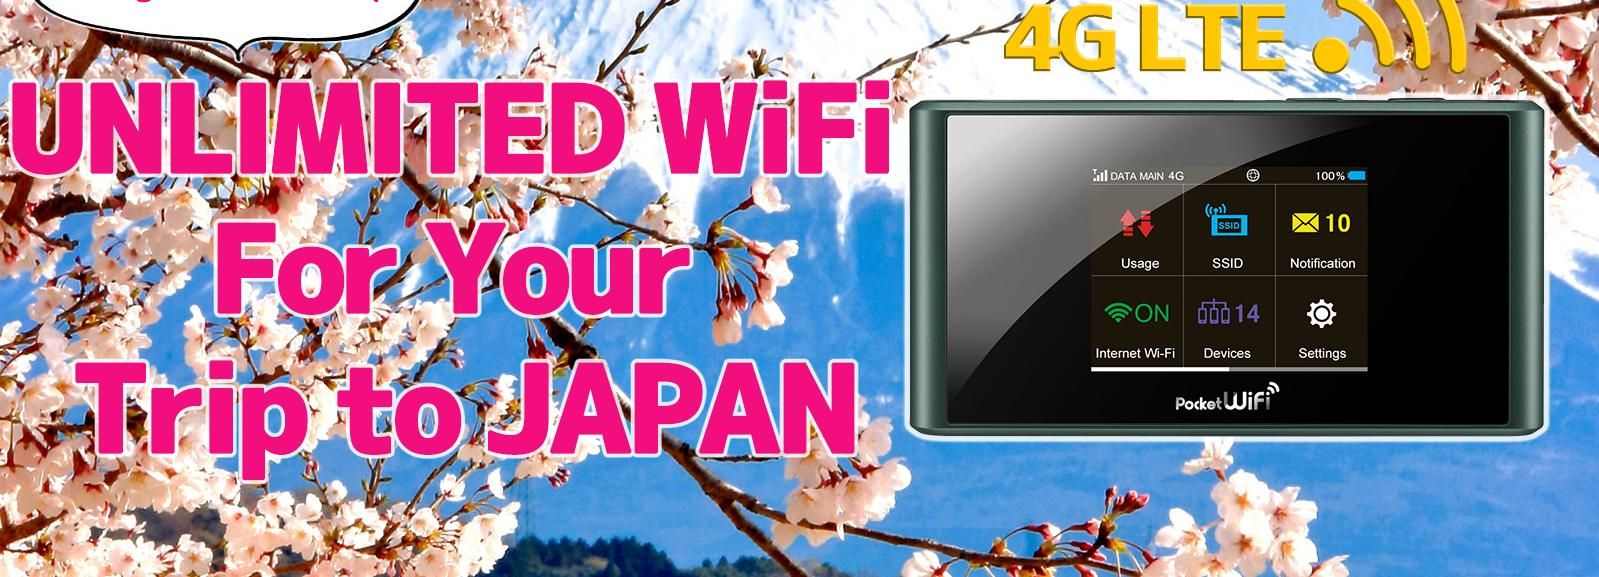 Shinjuku Pickup: Japan Pocket WiFi Router 4G LTE Unlimited